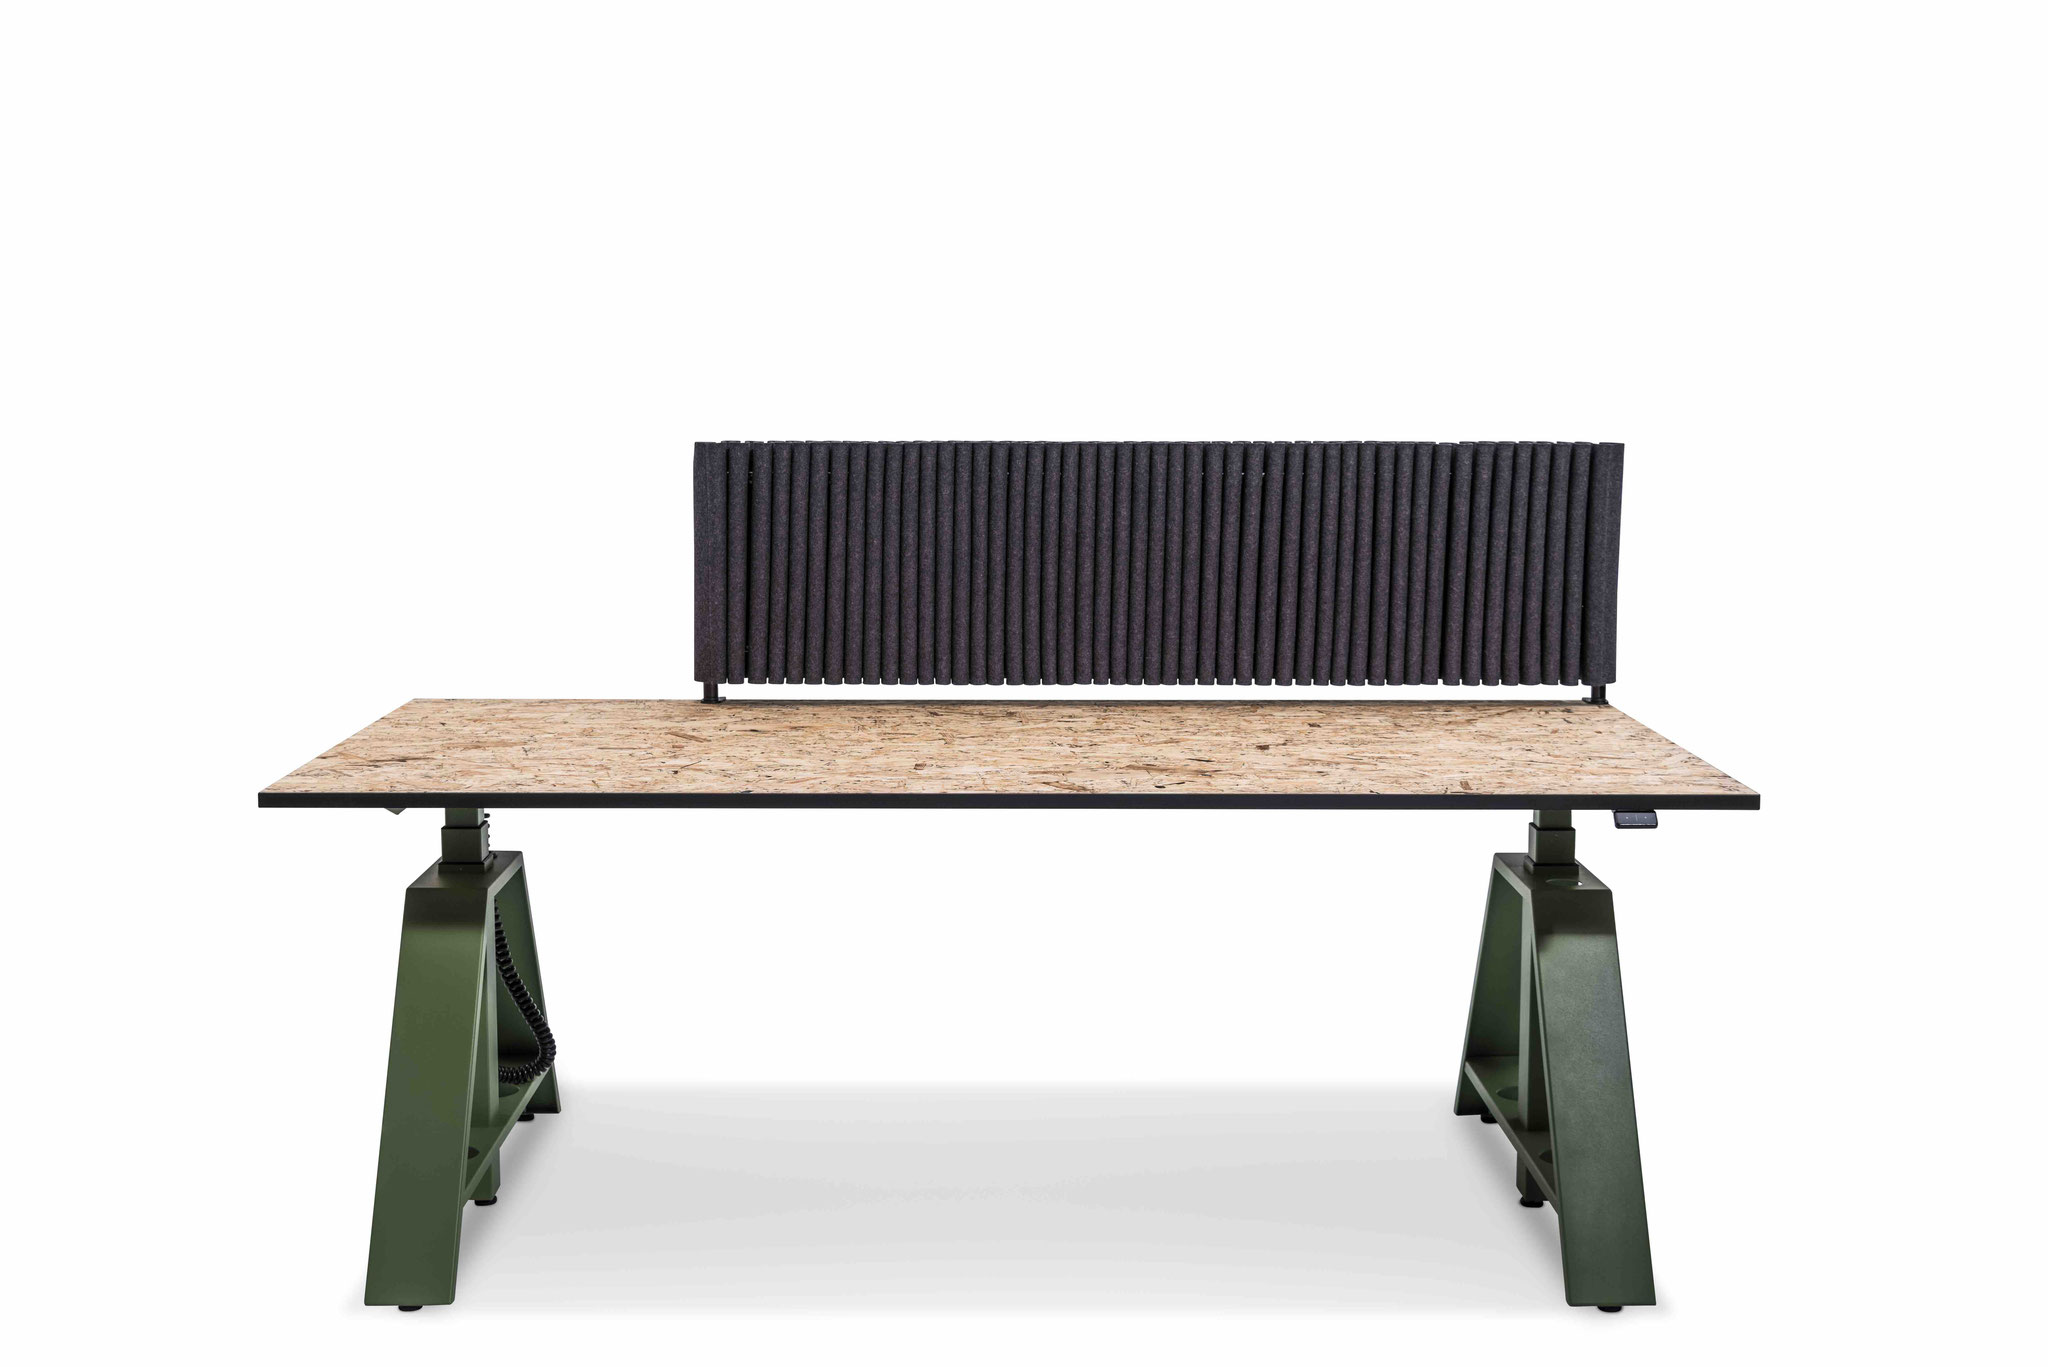 MOTU A PLUS, Gestell Resedagrün, Tischplatte OSB inkl. Akustikschutz